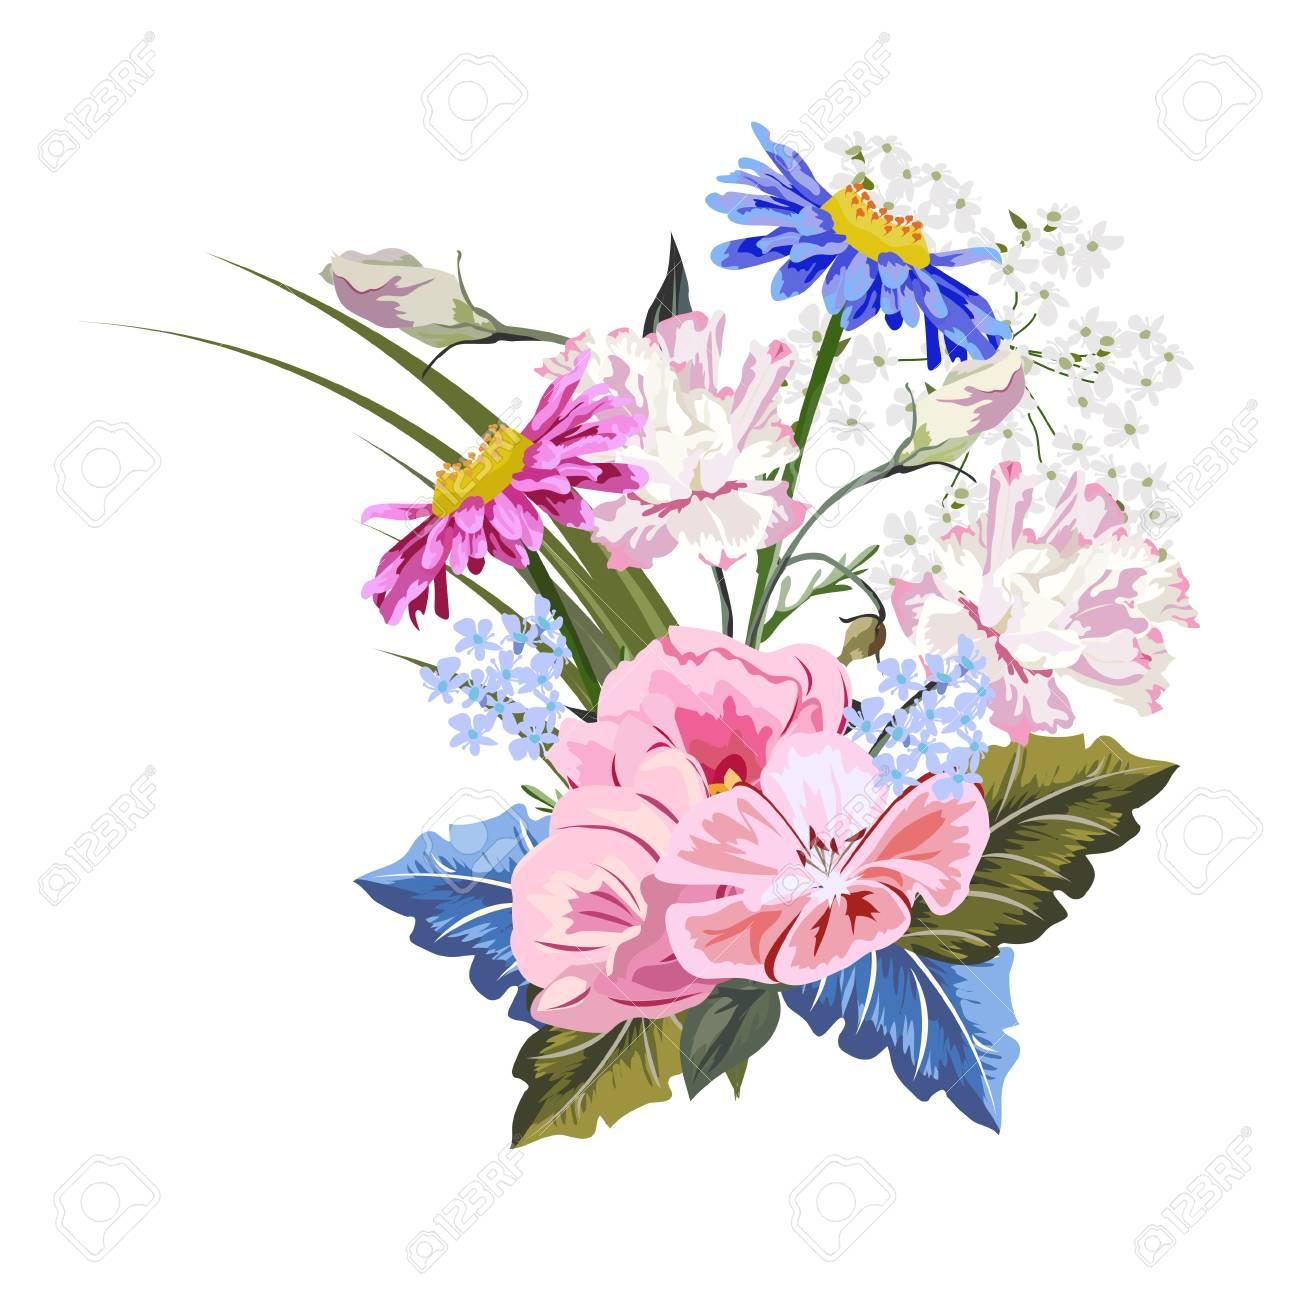 Decor Elements For Greeting Cards Wedding Invitations Birthday